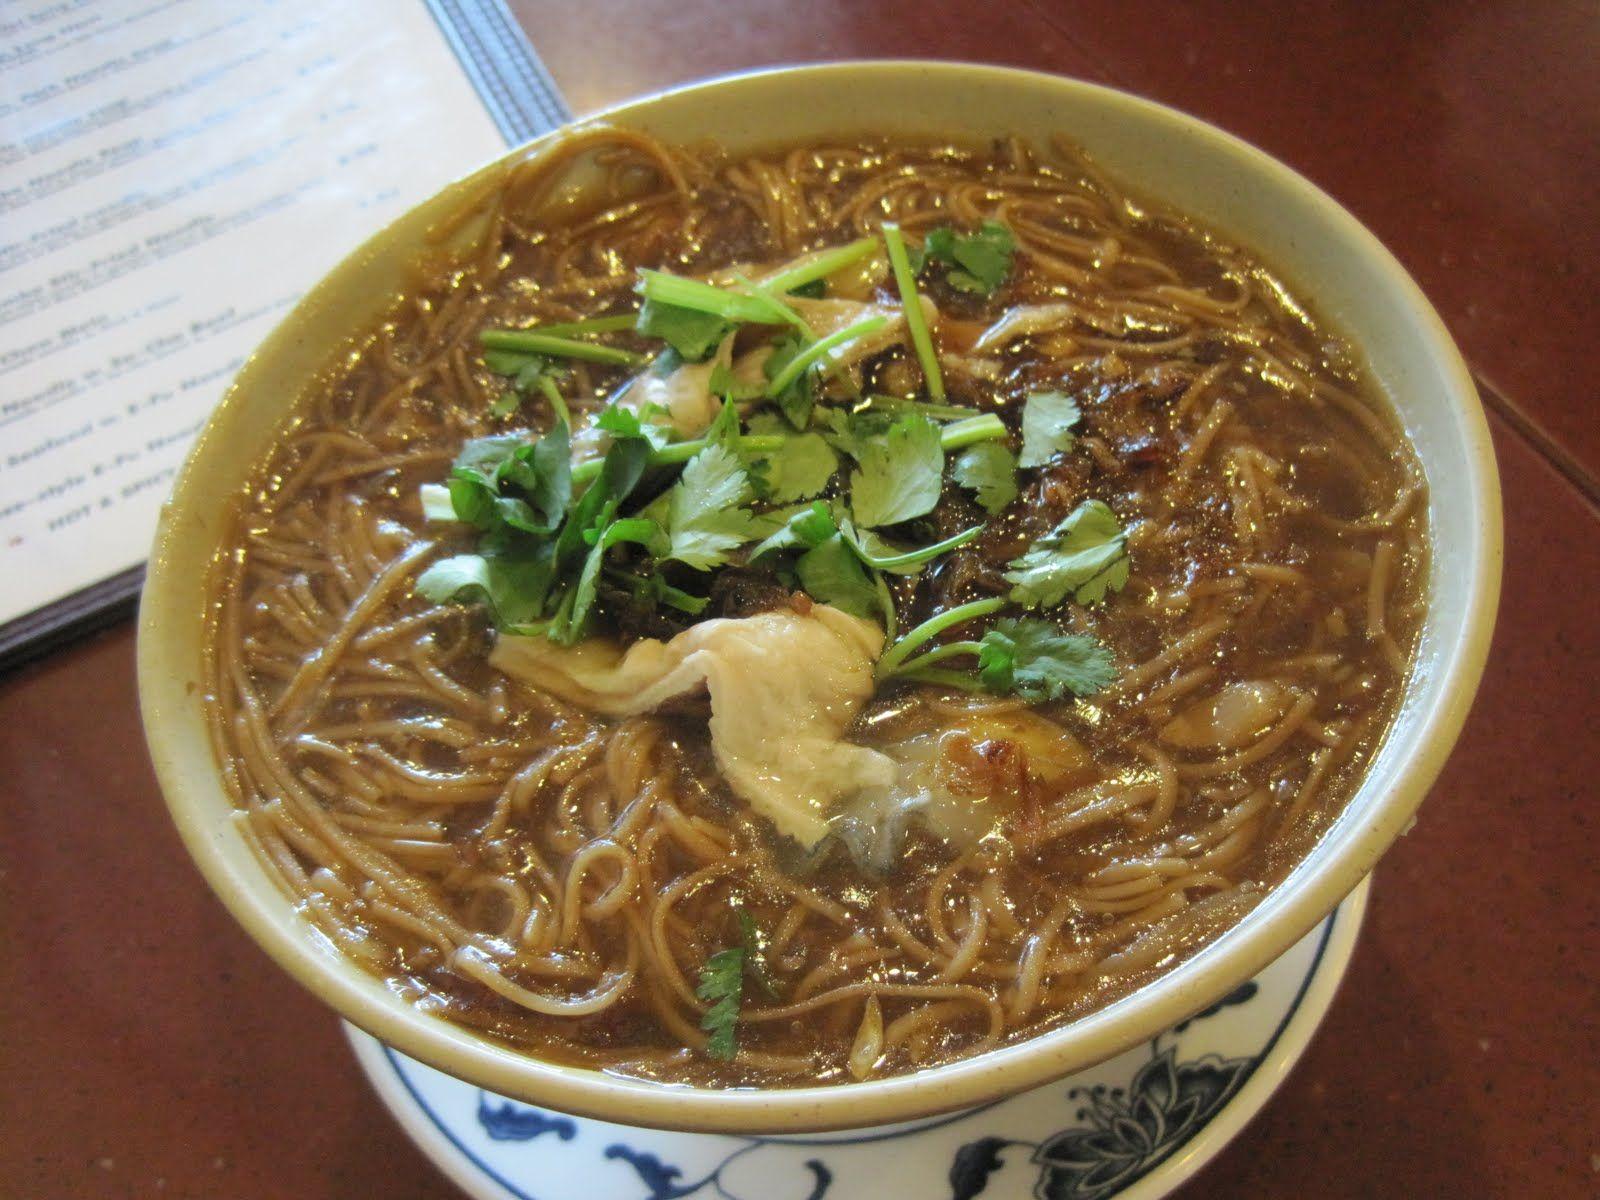 Best street food dishes in taipei taiwan taiwan has a